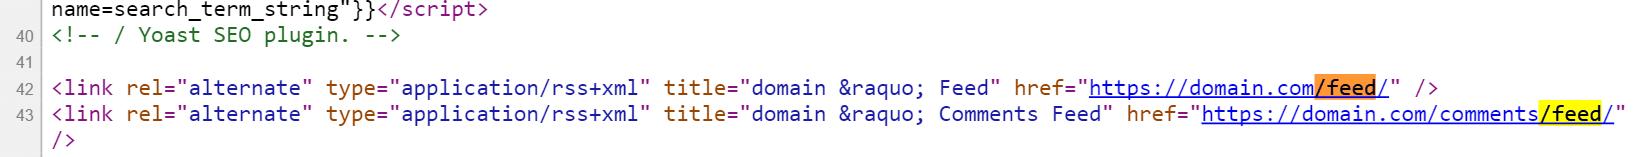 RSS feed no cabeçalho